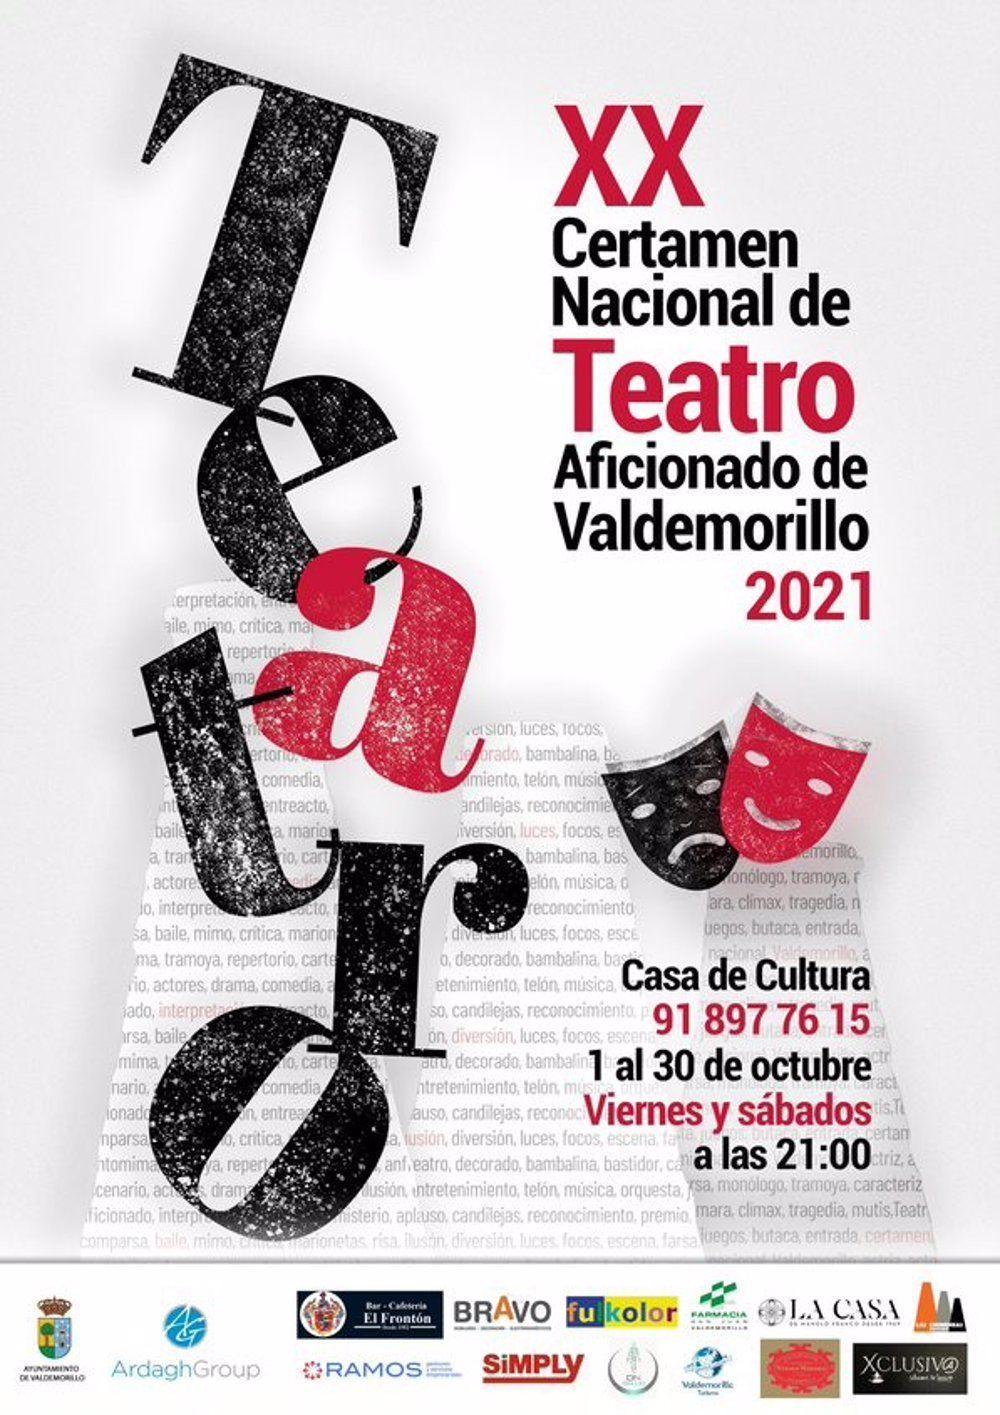 Certamen de Teatro Aficionado de Valdemorillo